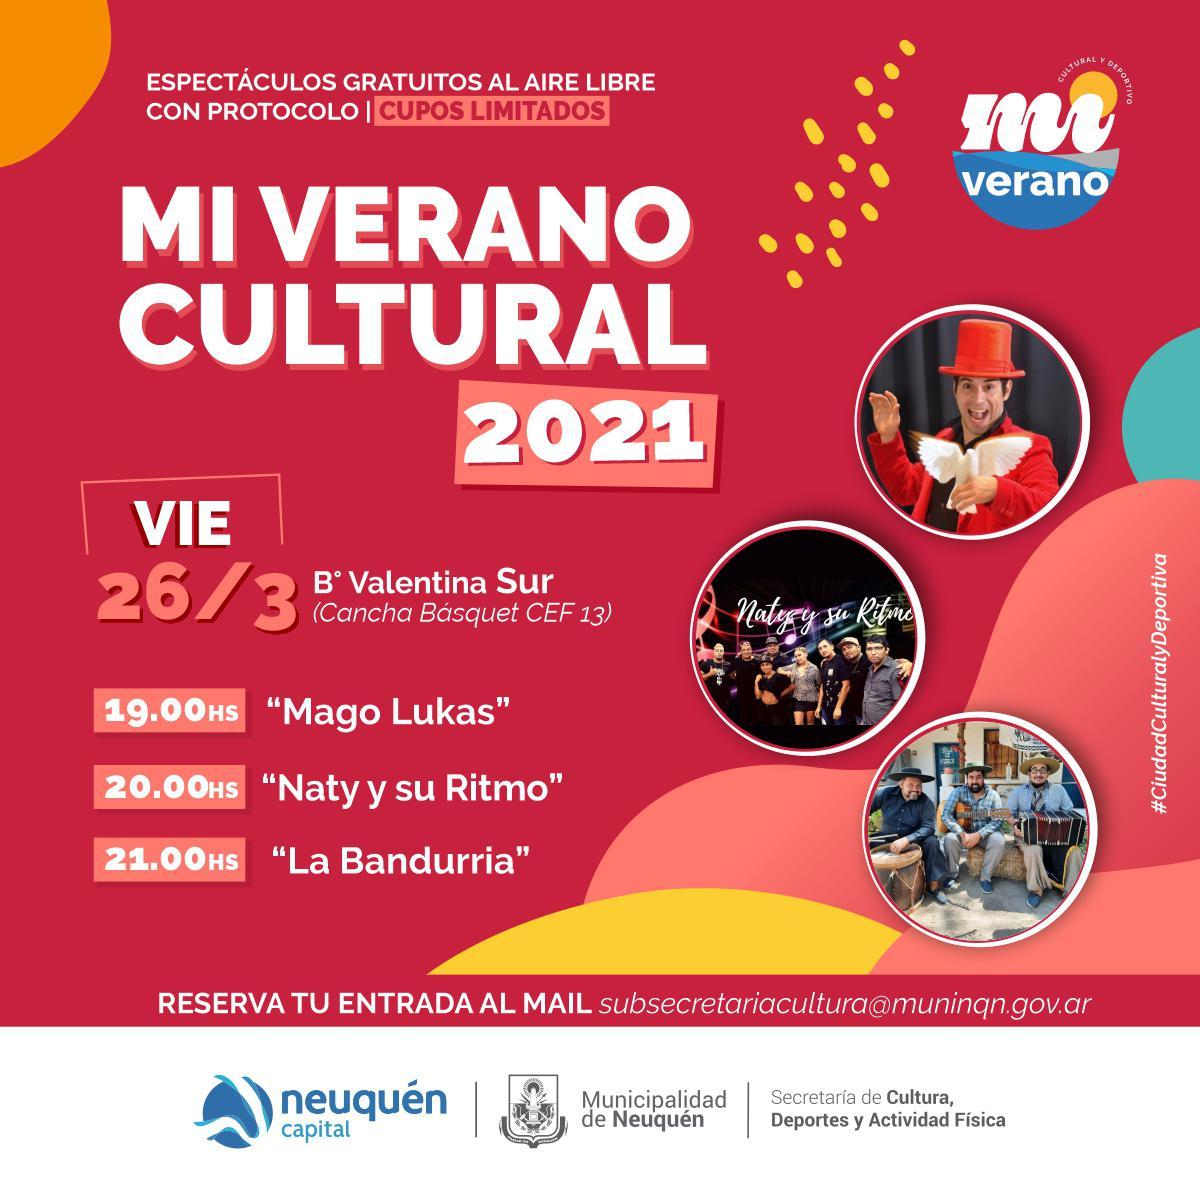 Mi verano Cultural_VALENTINA_VIE26 (2)